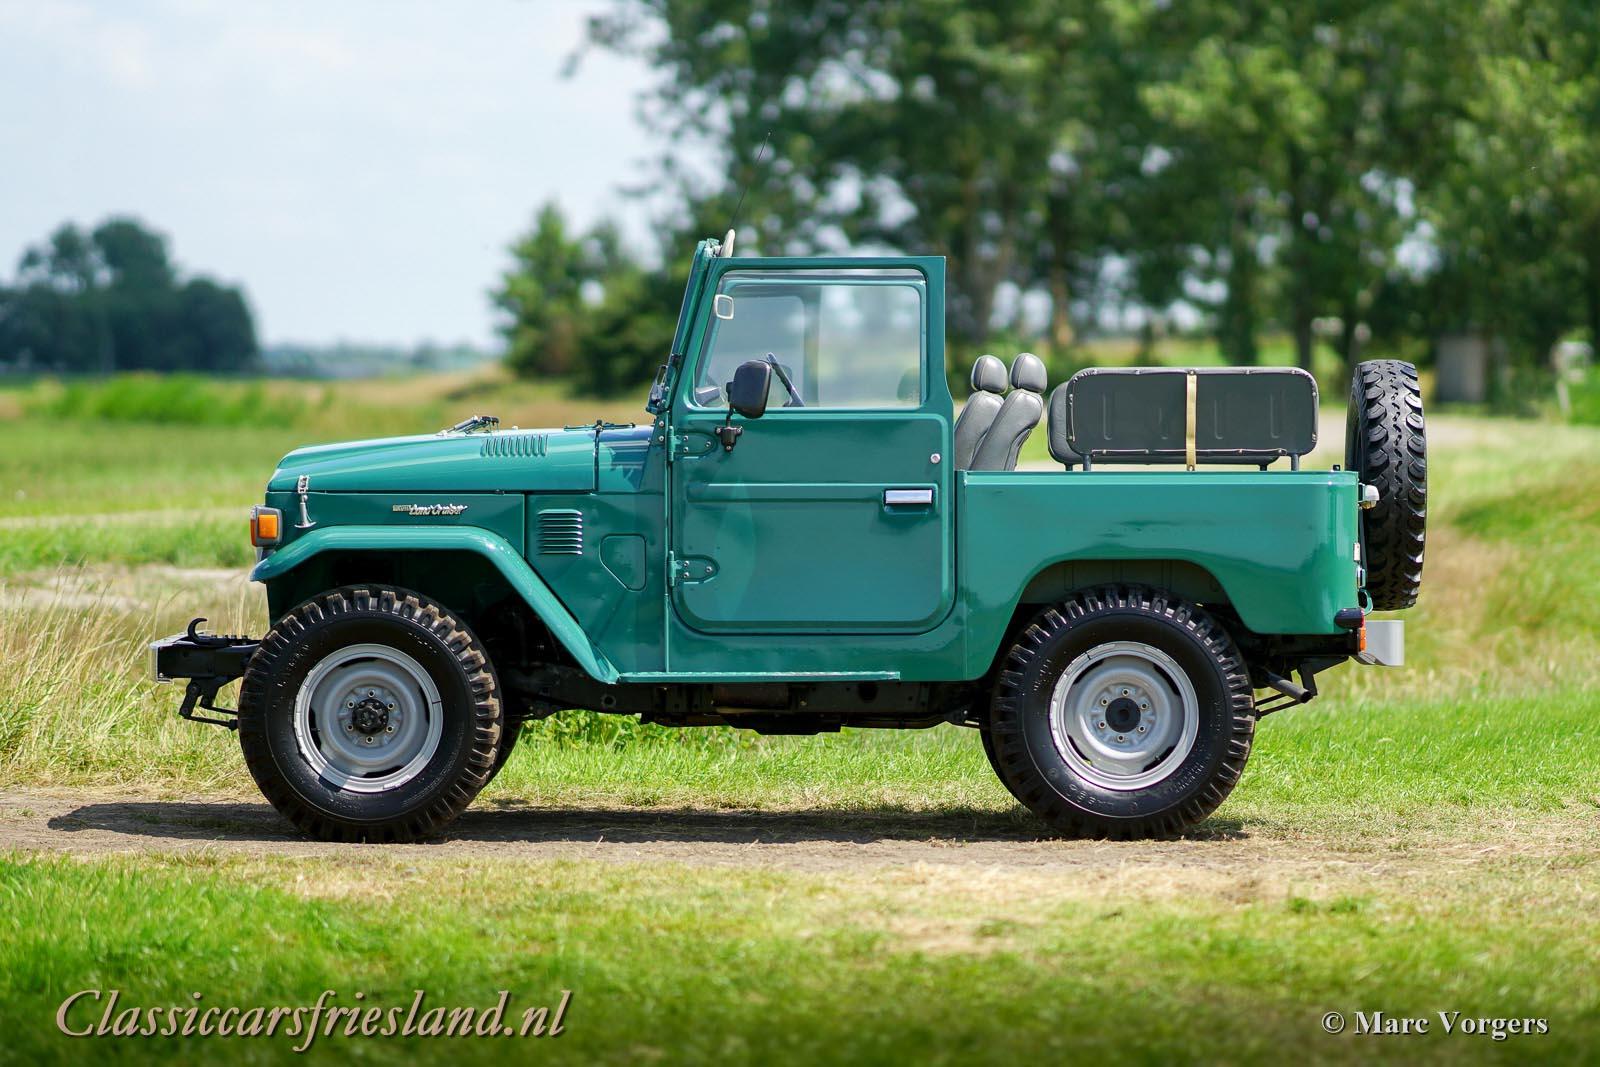 TOYOTA LAND CRUISER BJ40 1980 - Classic Cars Friesland